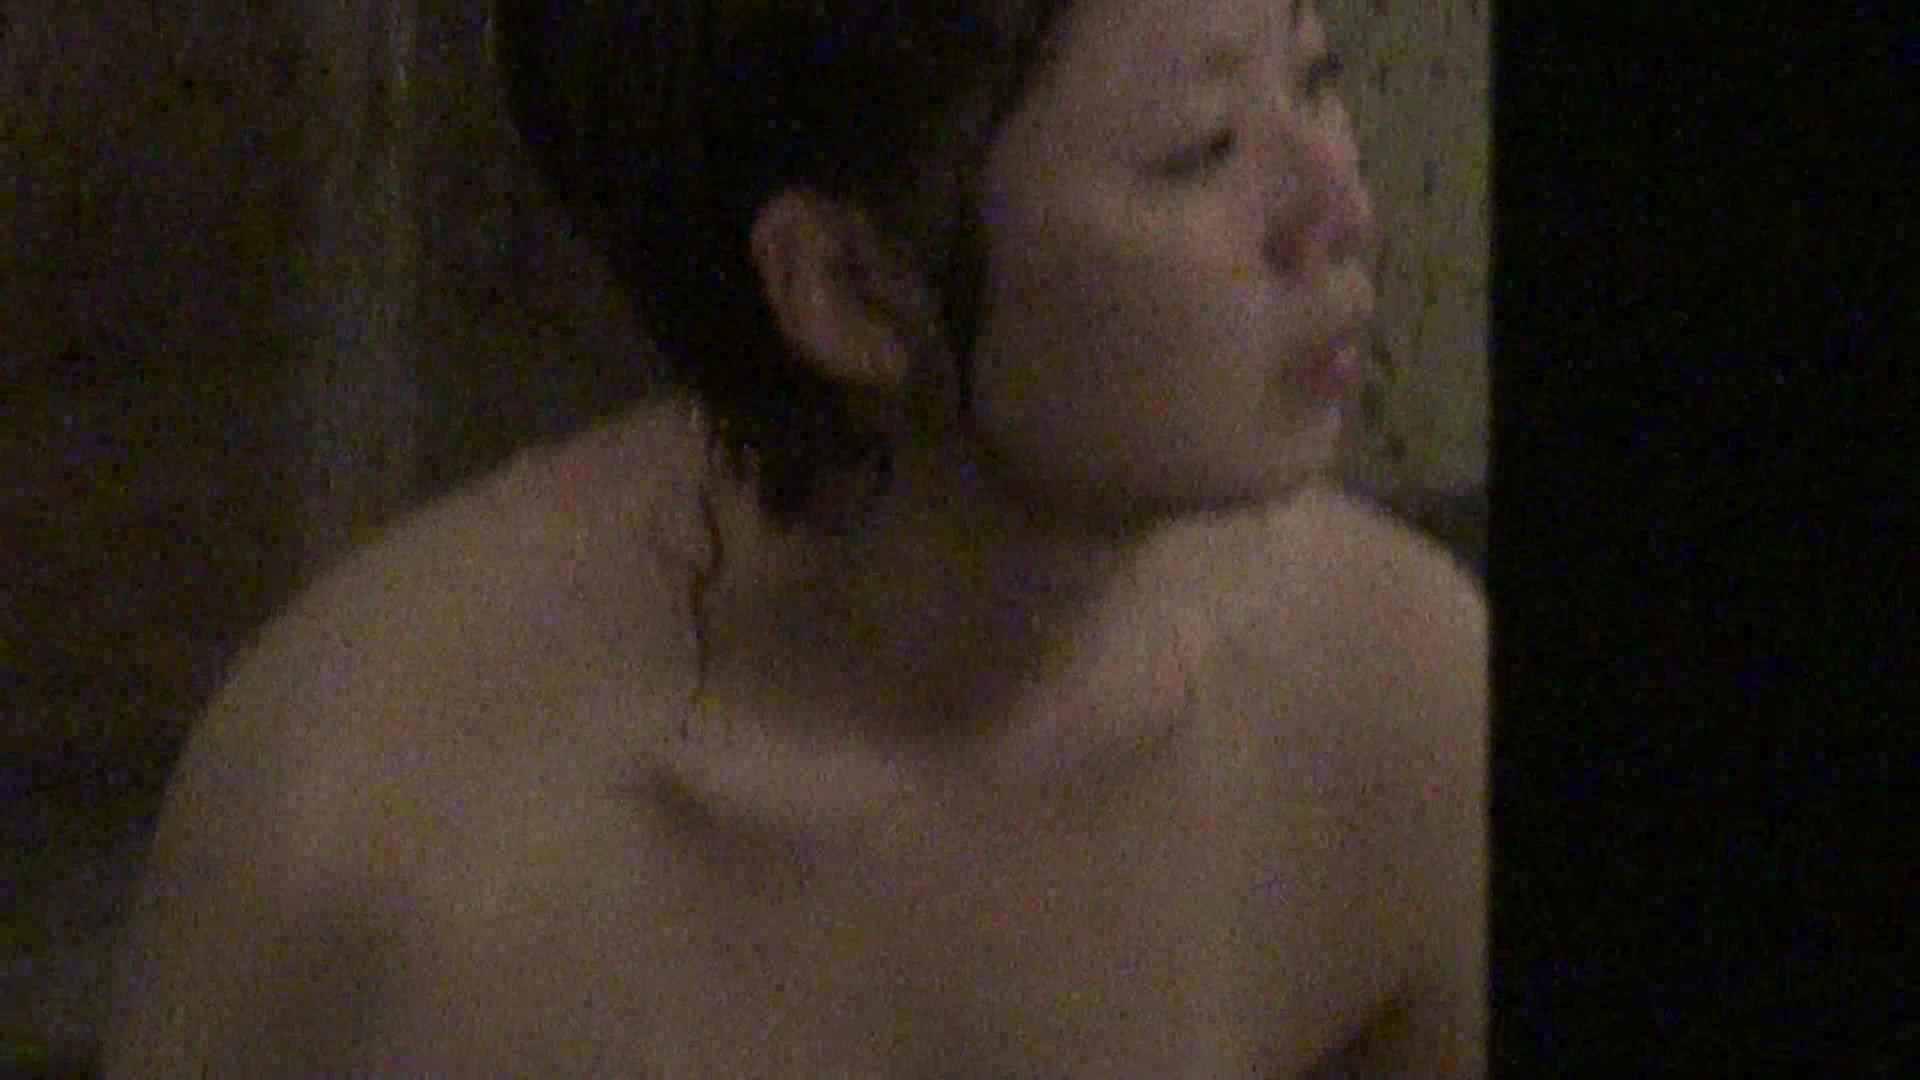 Aquaな露天風呂Vol.321 露天風呂編  85PIX 40